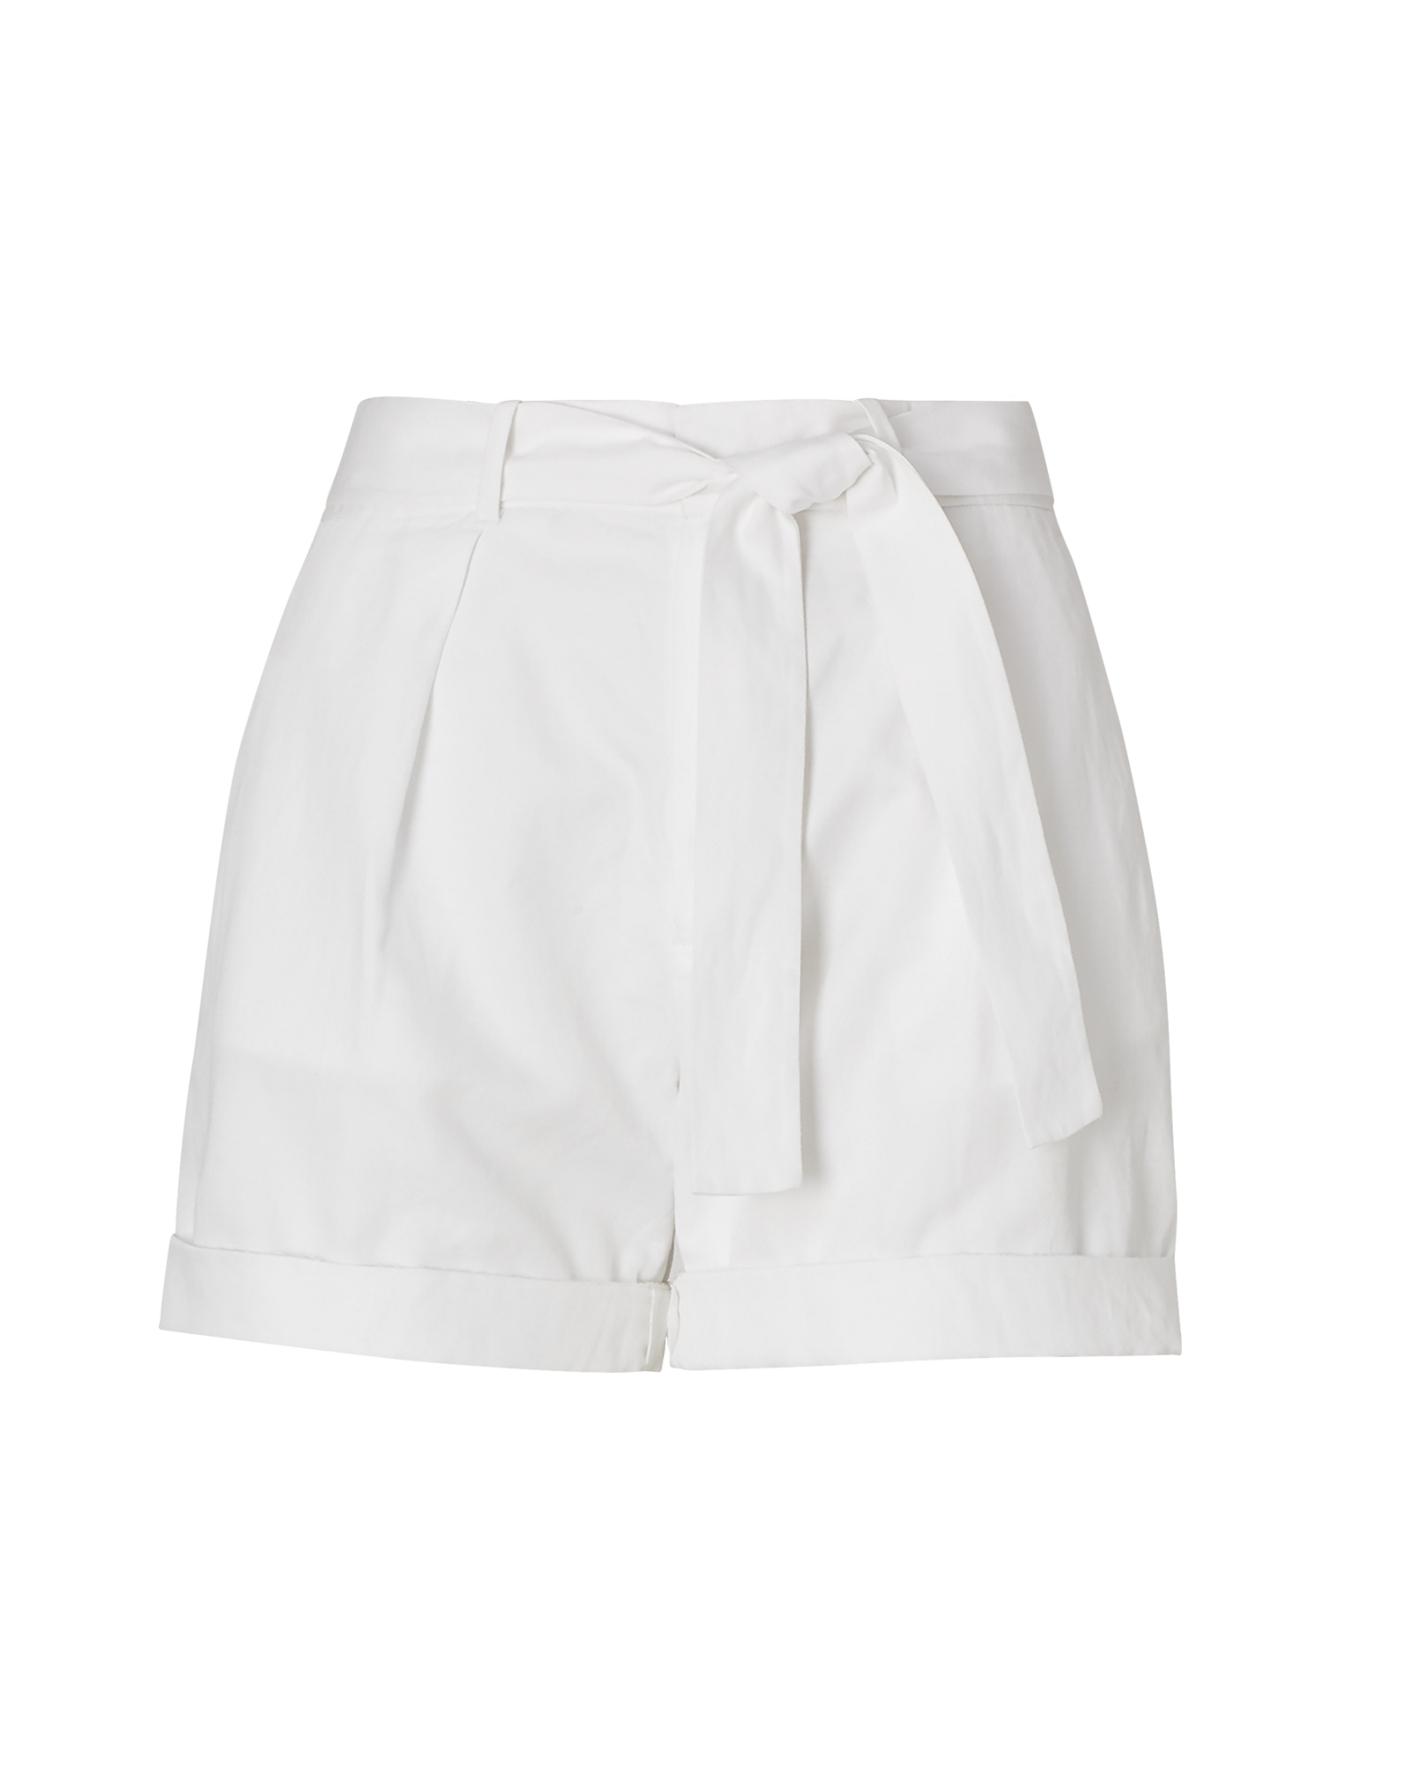 Women's Denim Shorts, Khaki Shorts, & Linen Shorts | Ralph Lauren